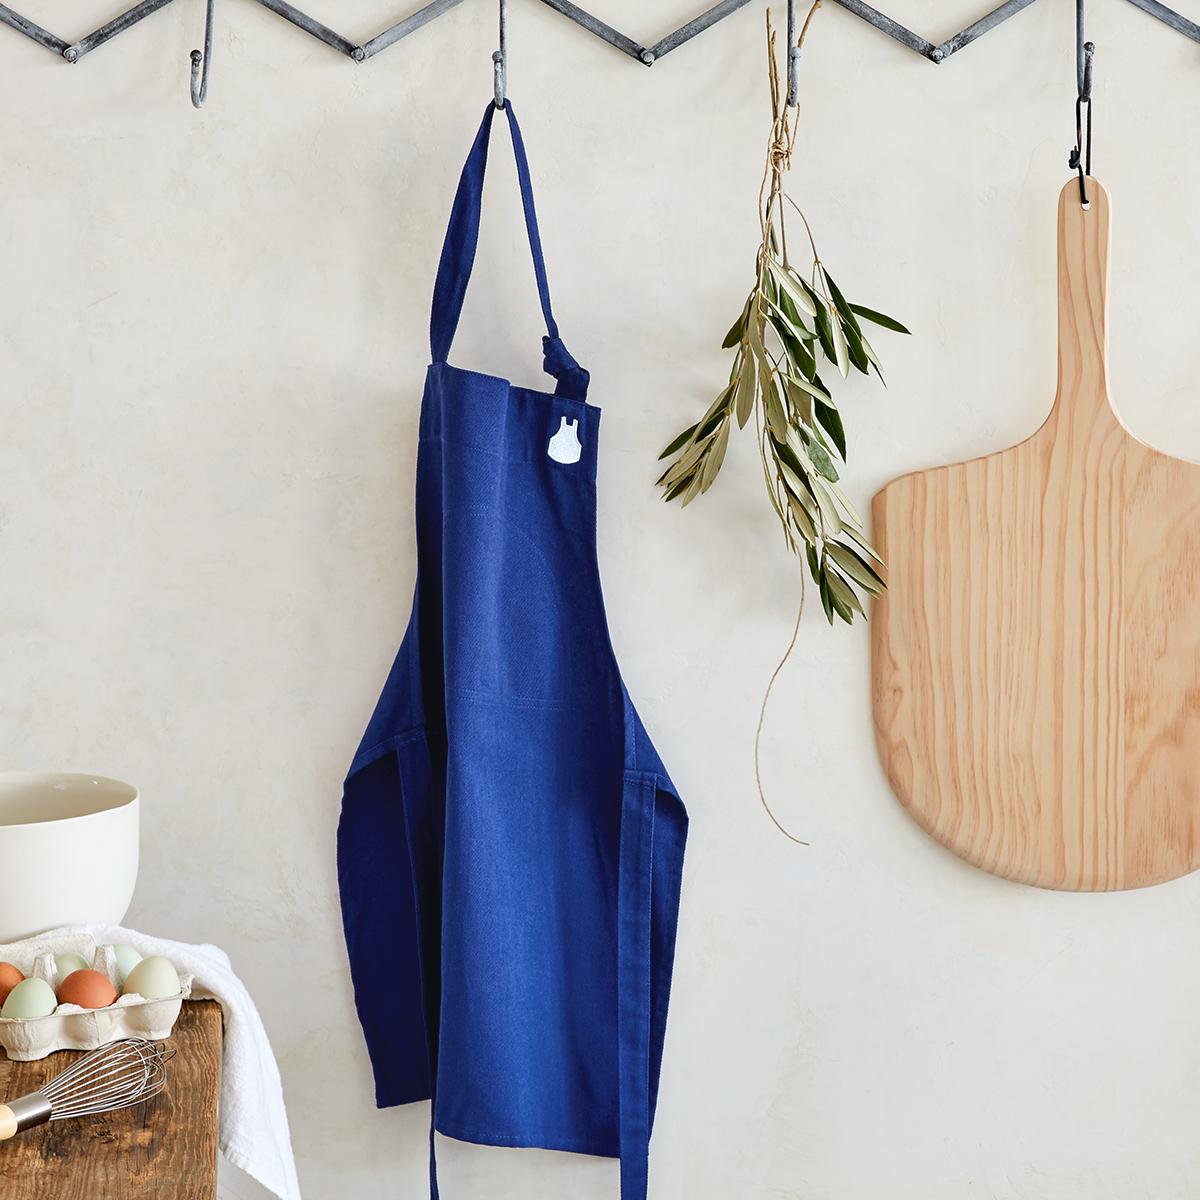 Blue apron problems - Check Out The Children S Blue Apron Now Available At Blue Apron Market Https